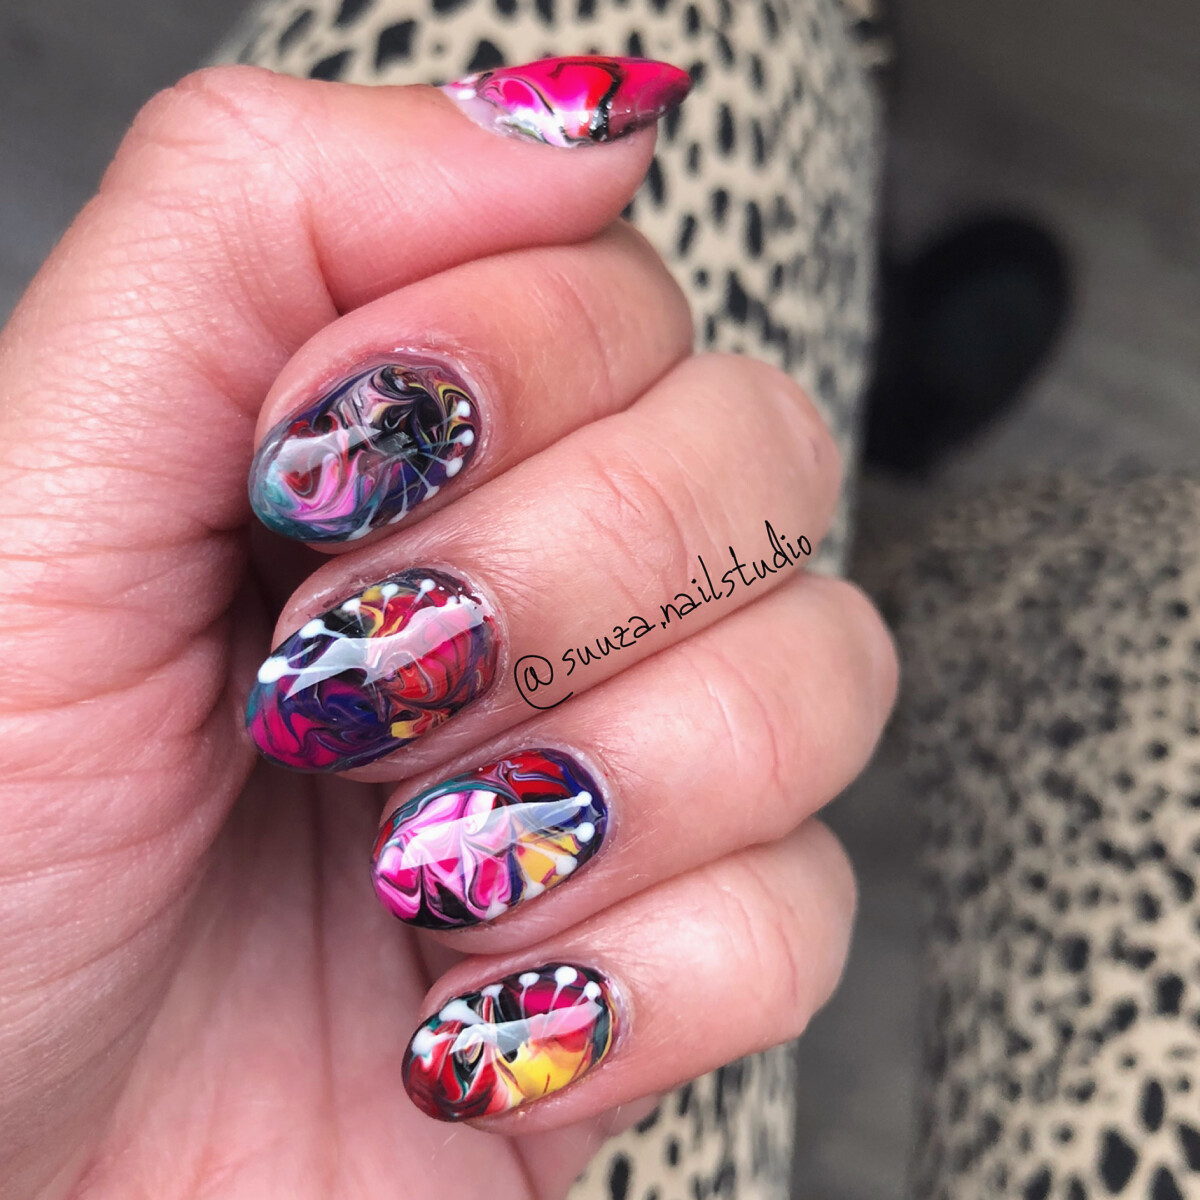 Artistic marble effect nail art